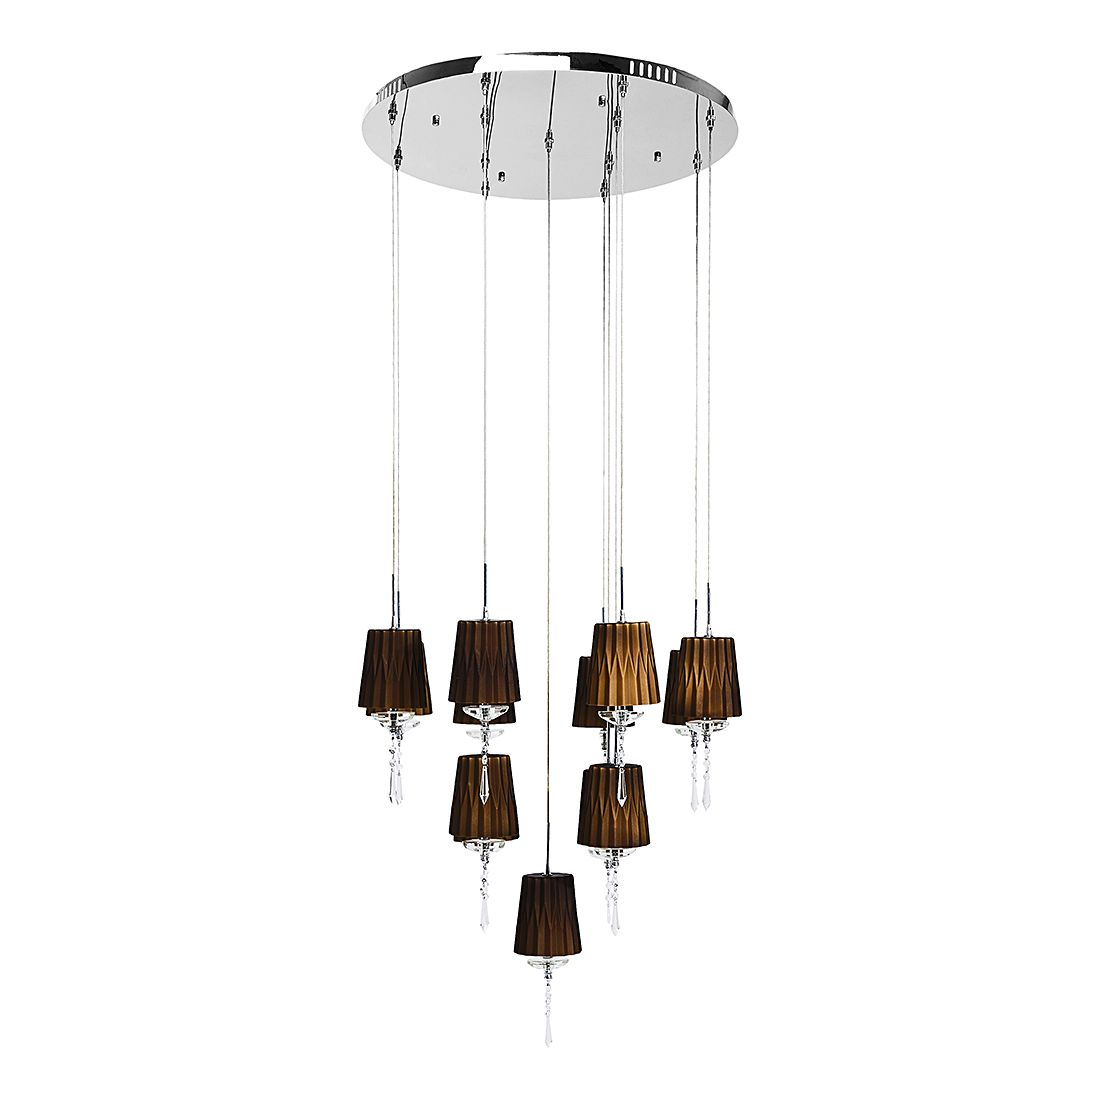 EEK C, Pendelleuchte HL Art Deco 13er – Metall/Glas – 13-flammig, Kare Design jetzt kaufen